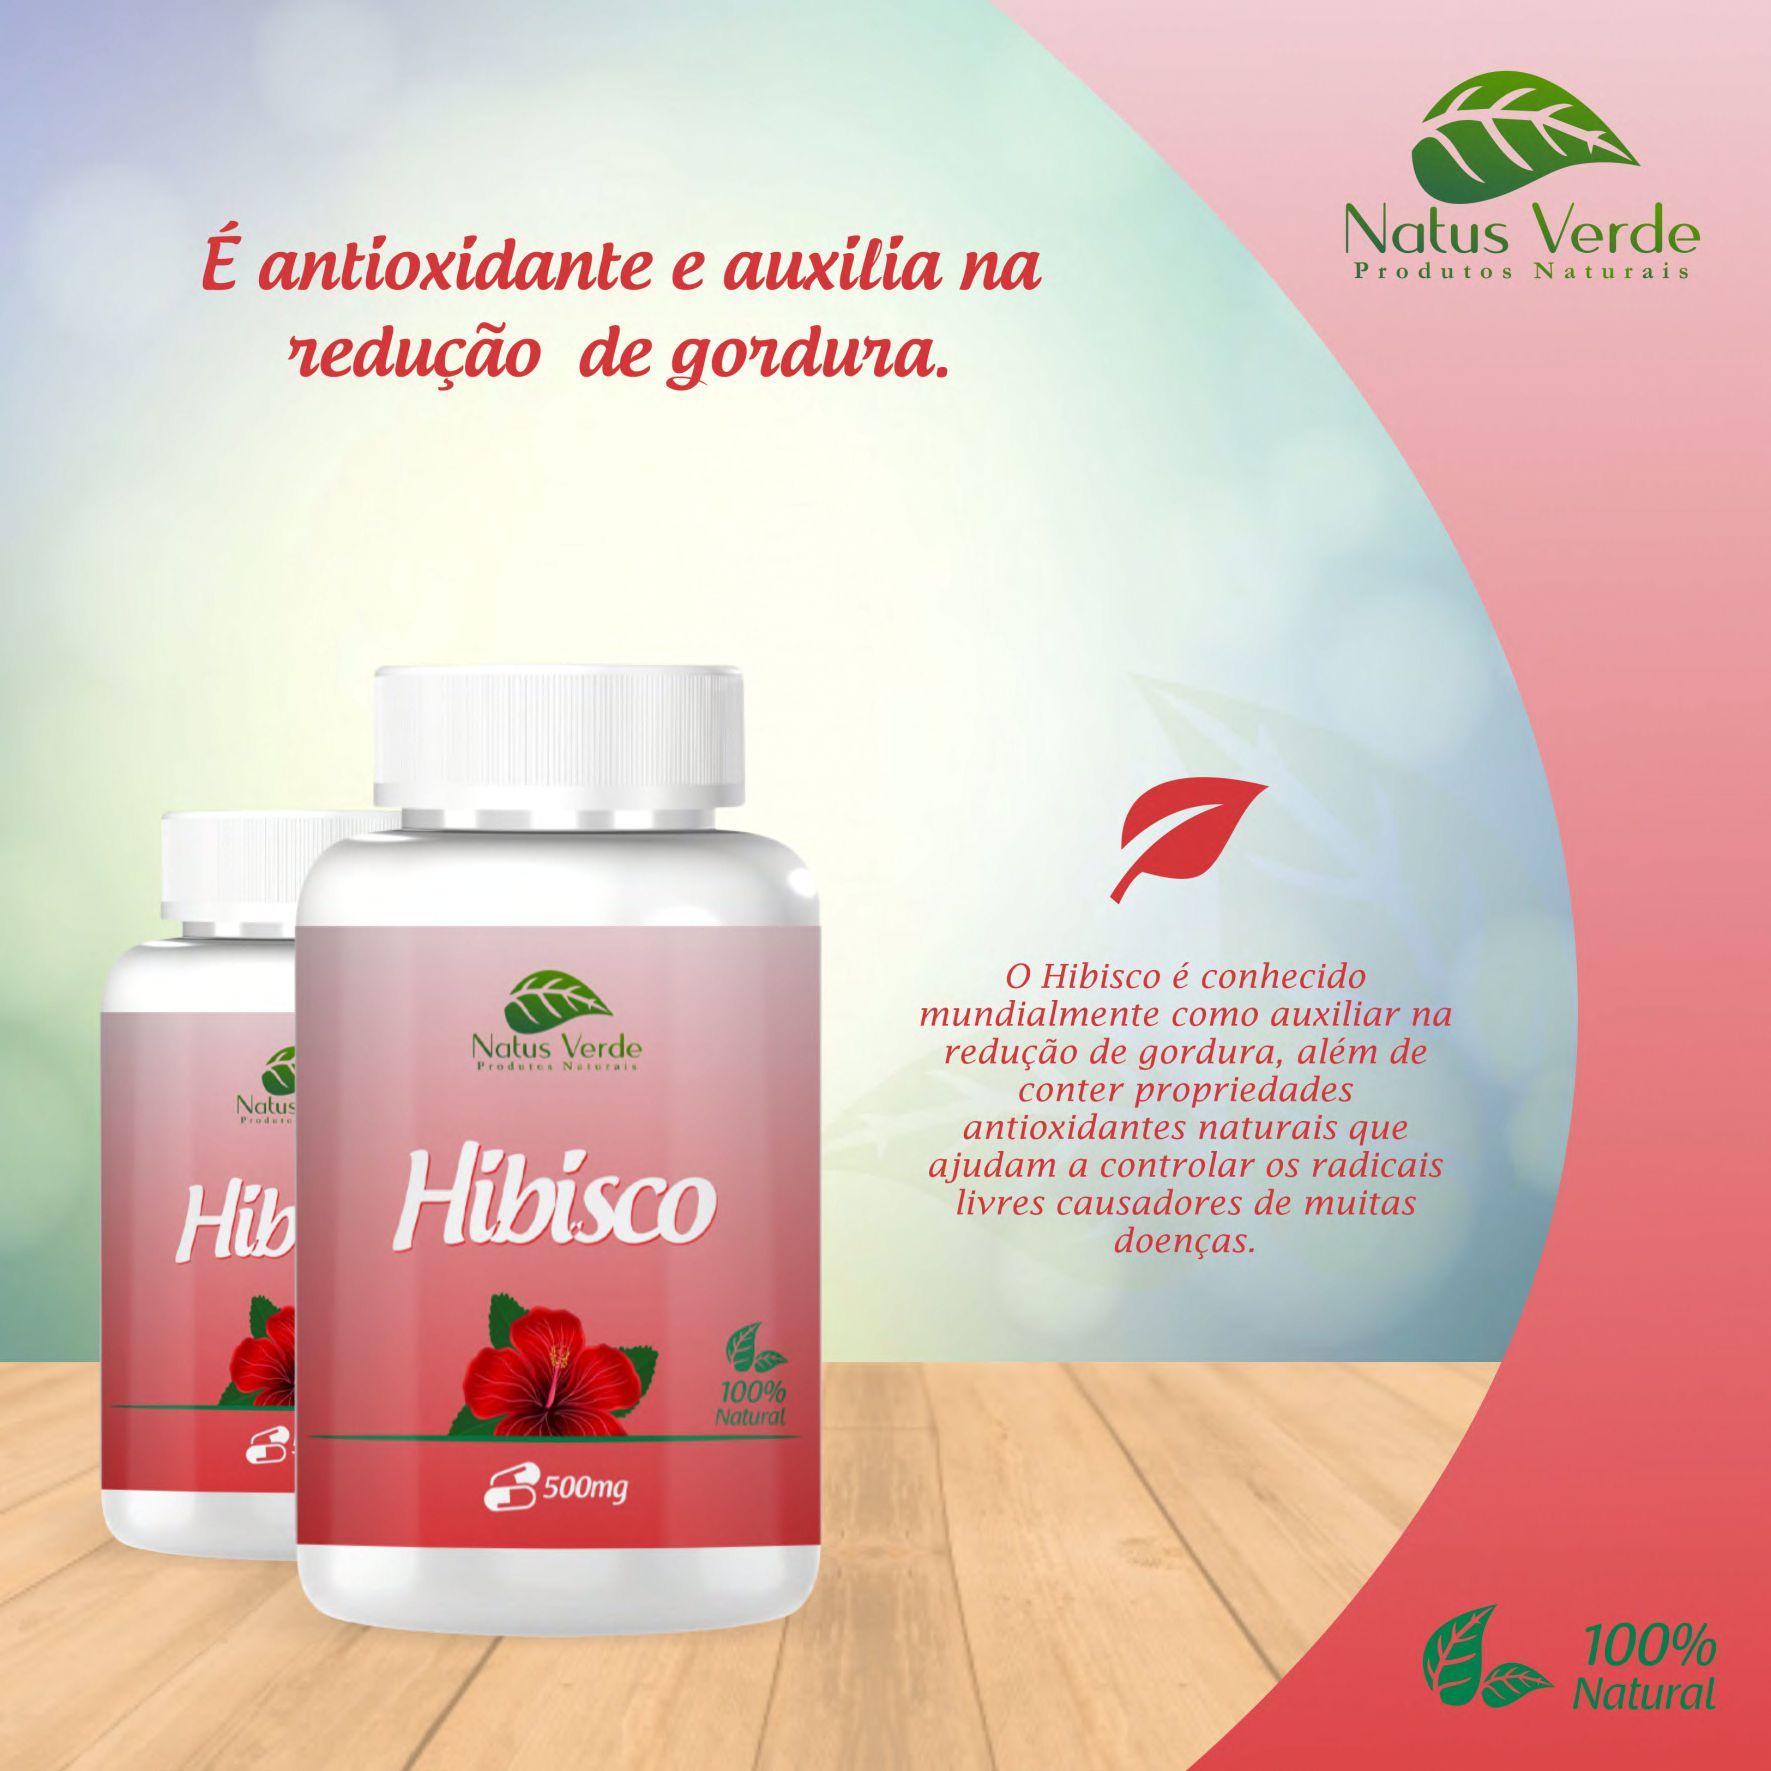 Seca Barriga Natural Hibisco 60 Caps Natus Verde   - Fribasex - Fabricasex.com